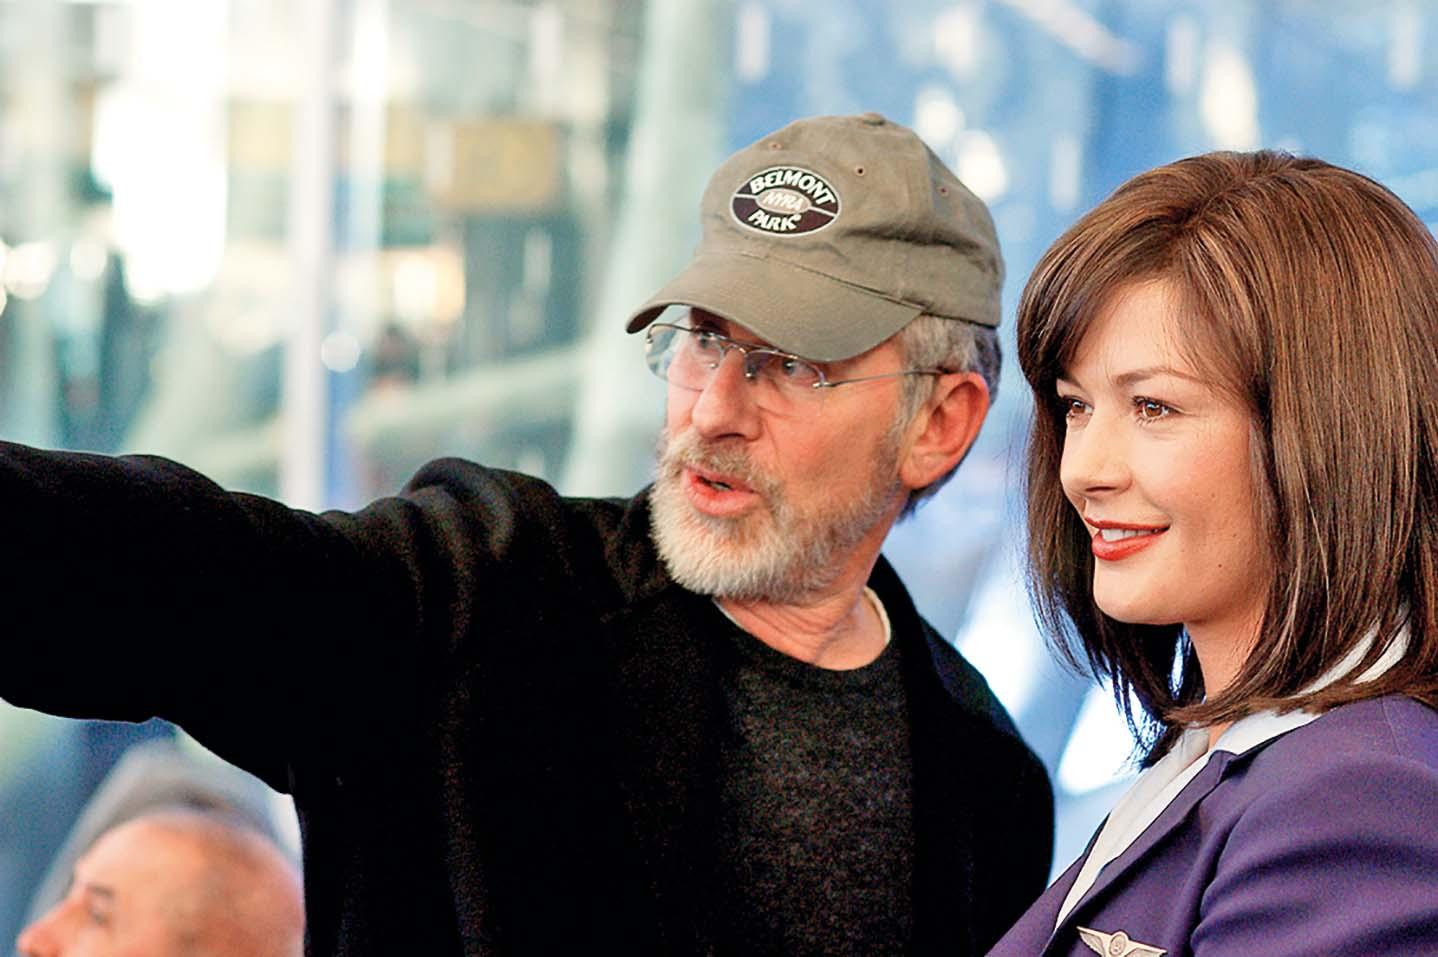 THE TERMINAL, Director Steven Spielberg, Catherine Zeta-Jones, 2004, (c) DreamWorks/courtesy Everett Collection